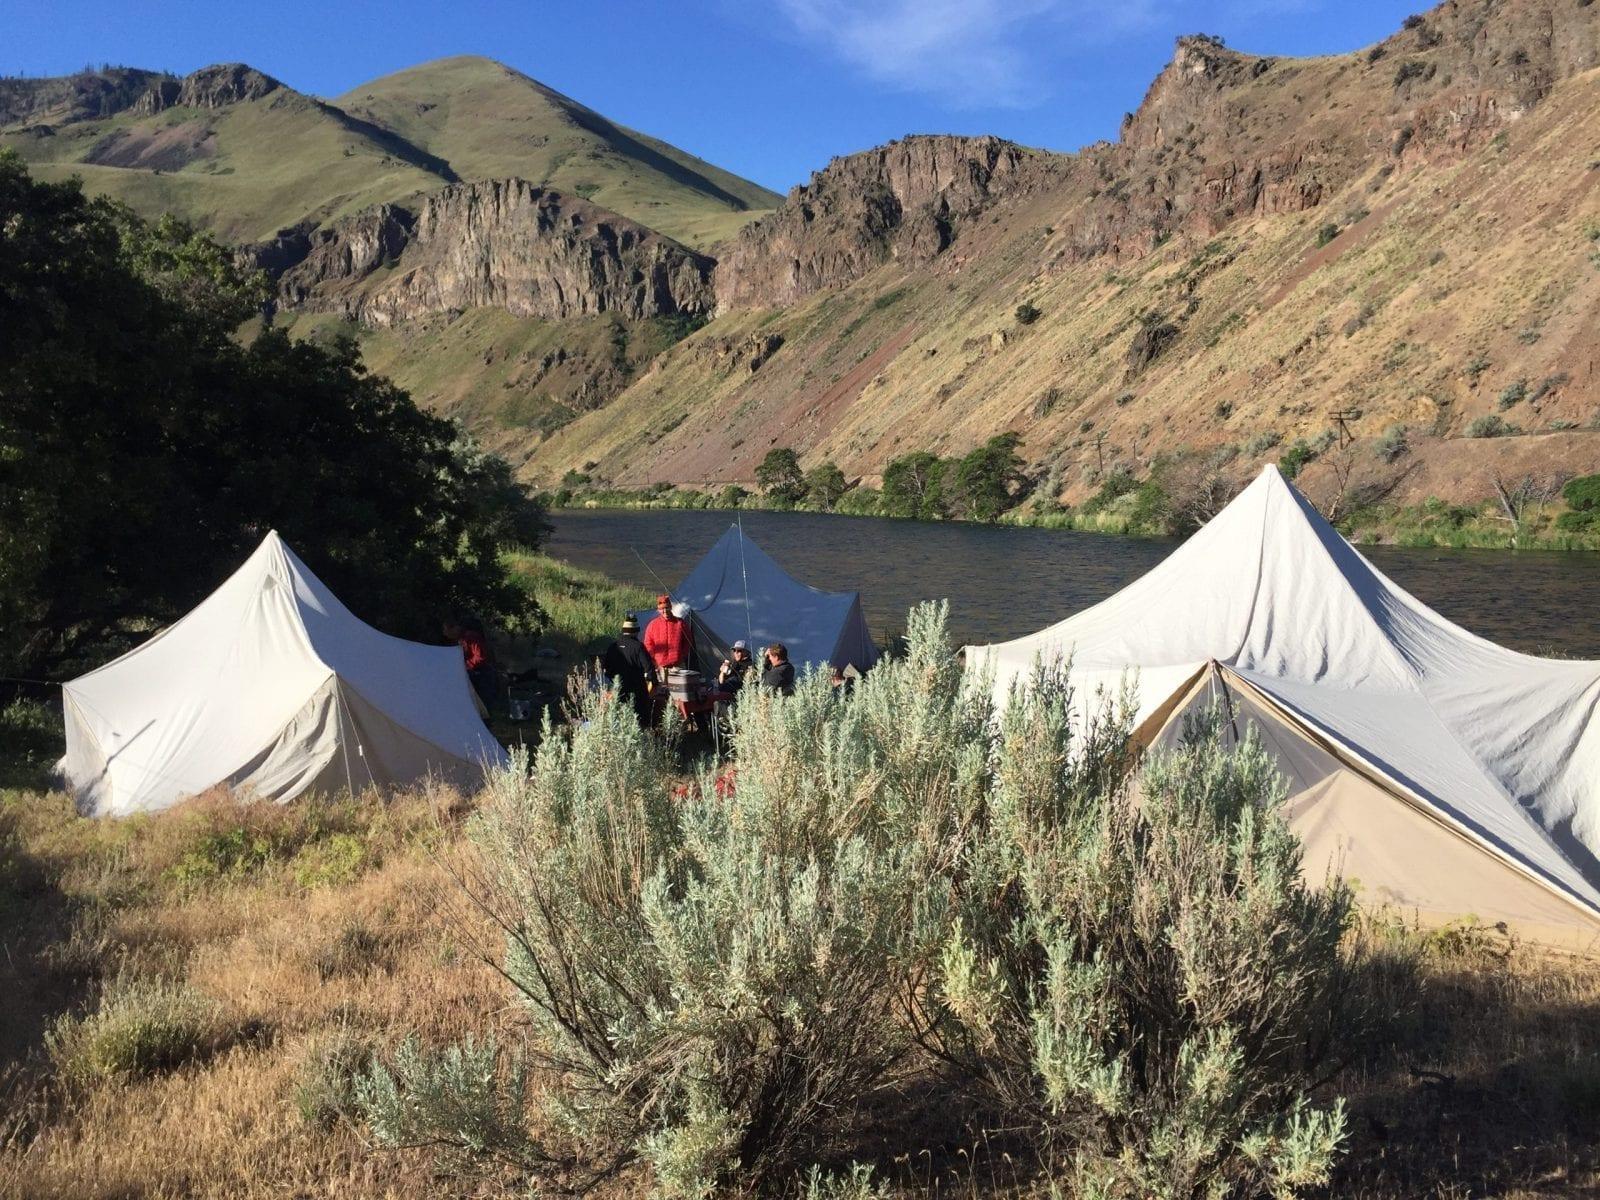 Riverside camp on the Deschutes.